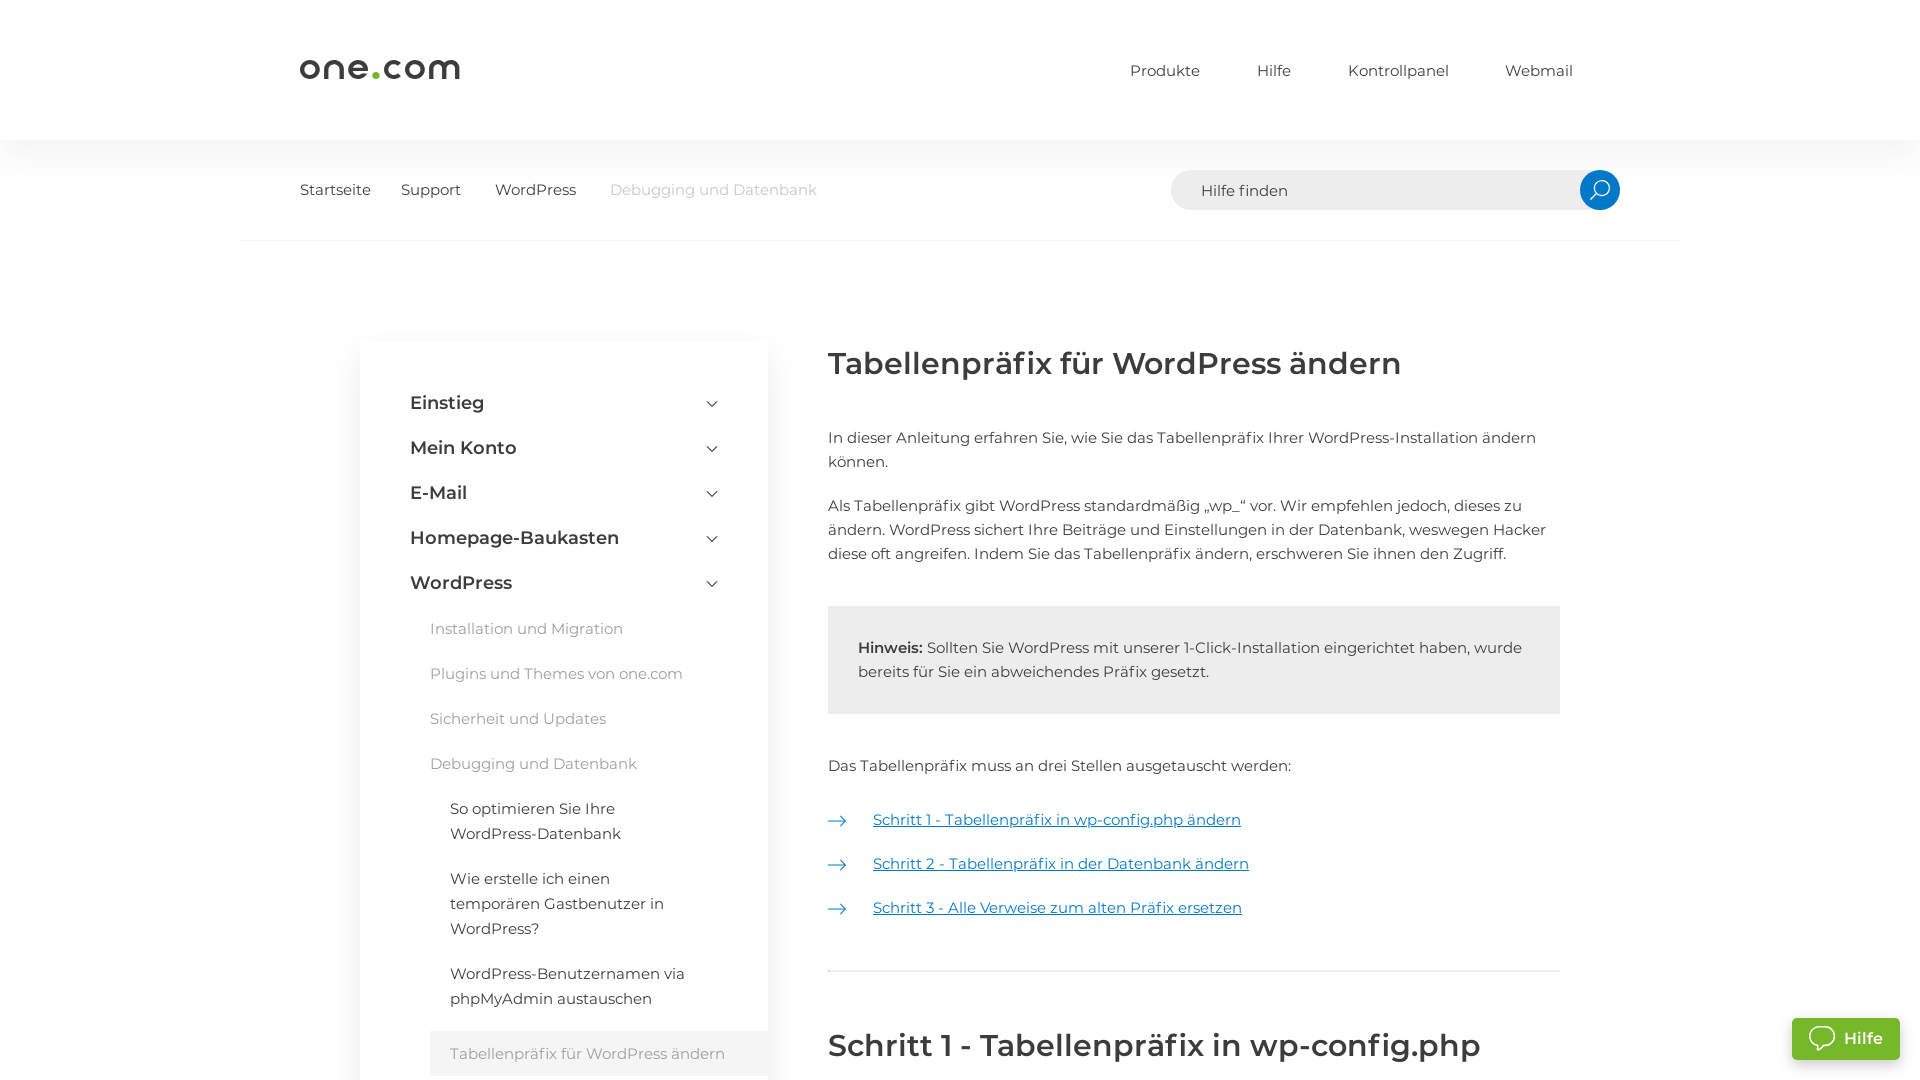 https://help.one.com/hc/de/articles/360002107438-Tabellenprfix-fr-WordPress-ndern